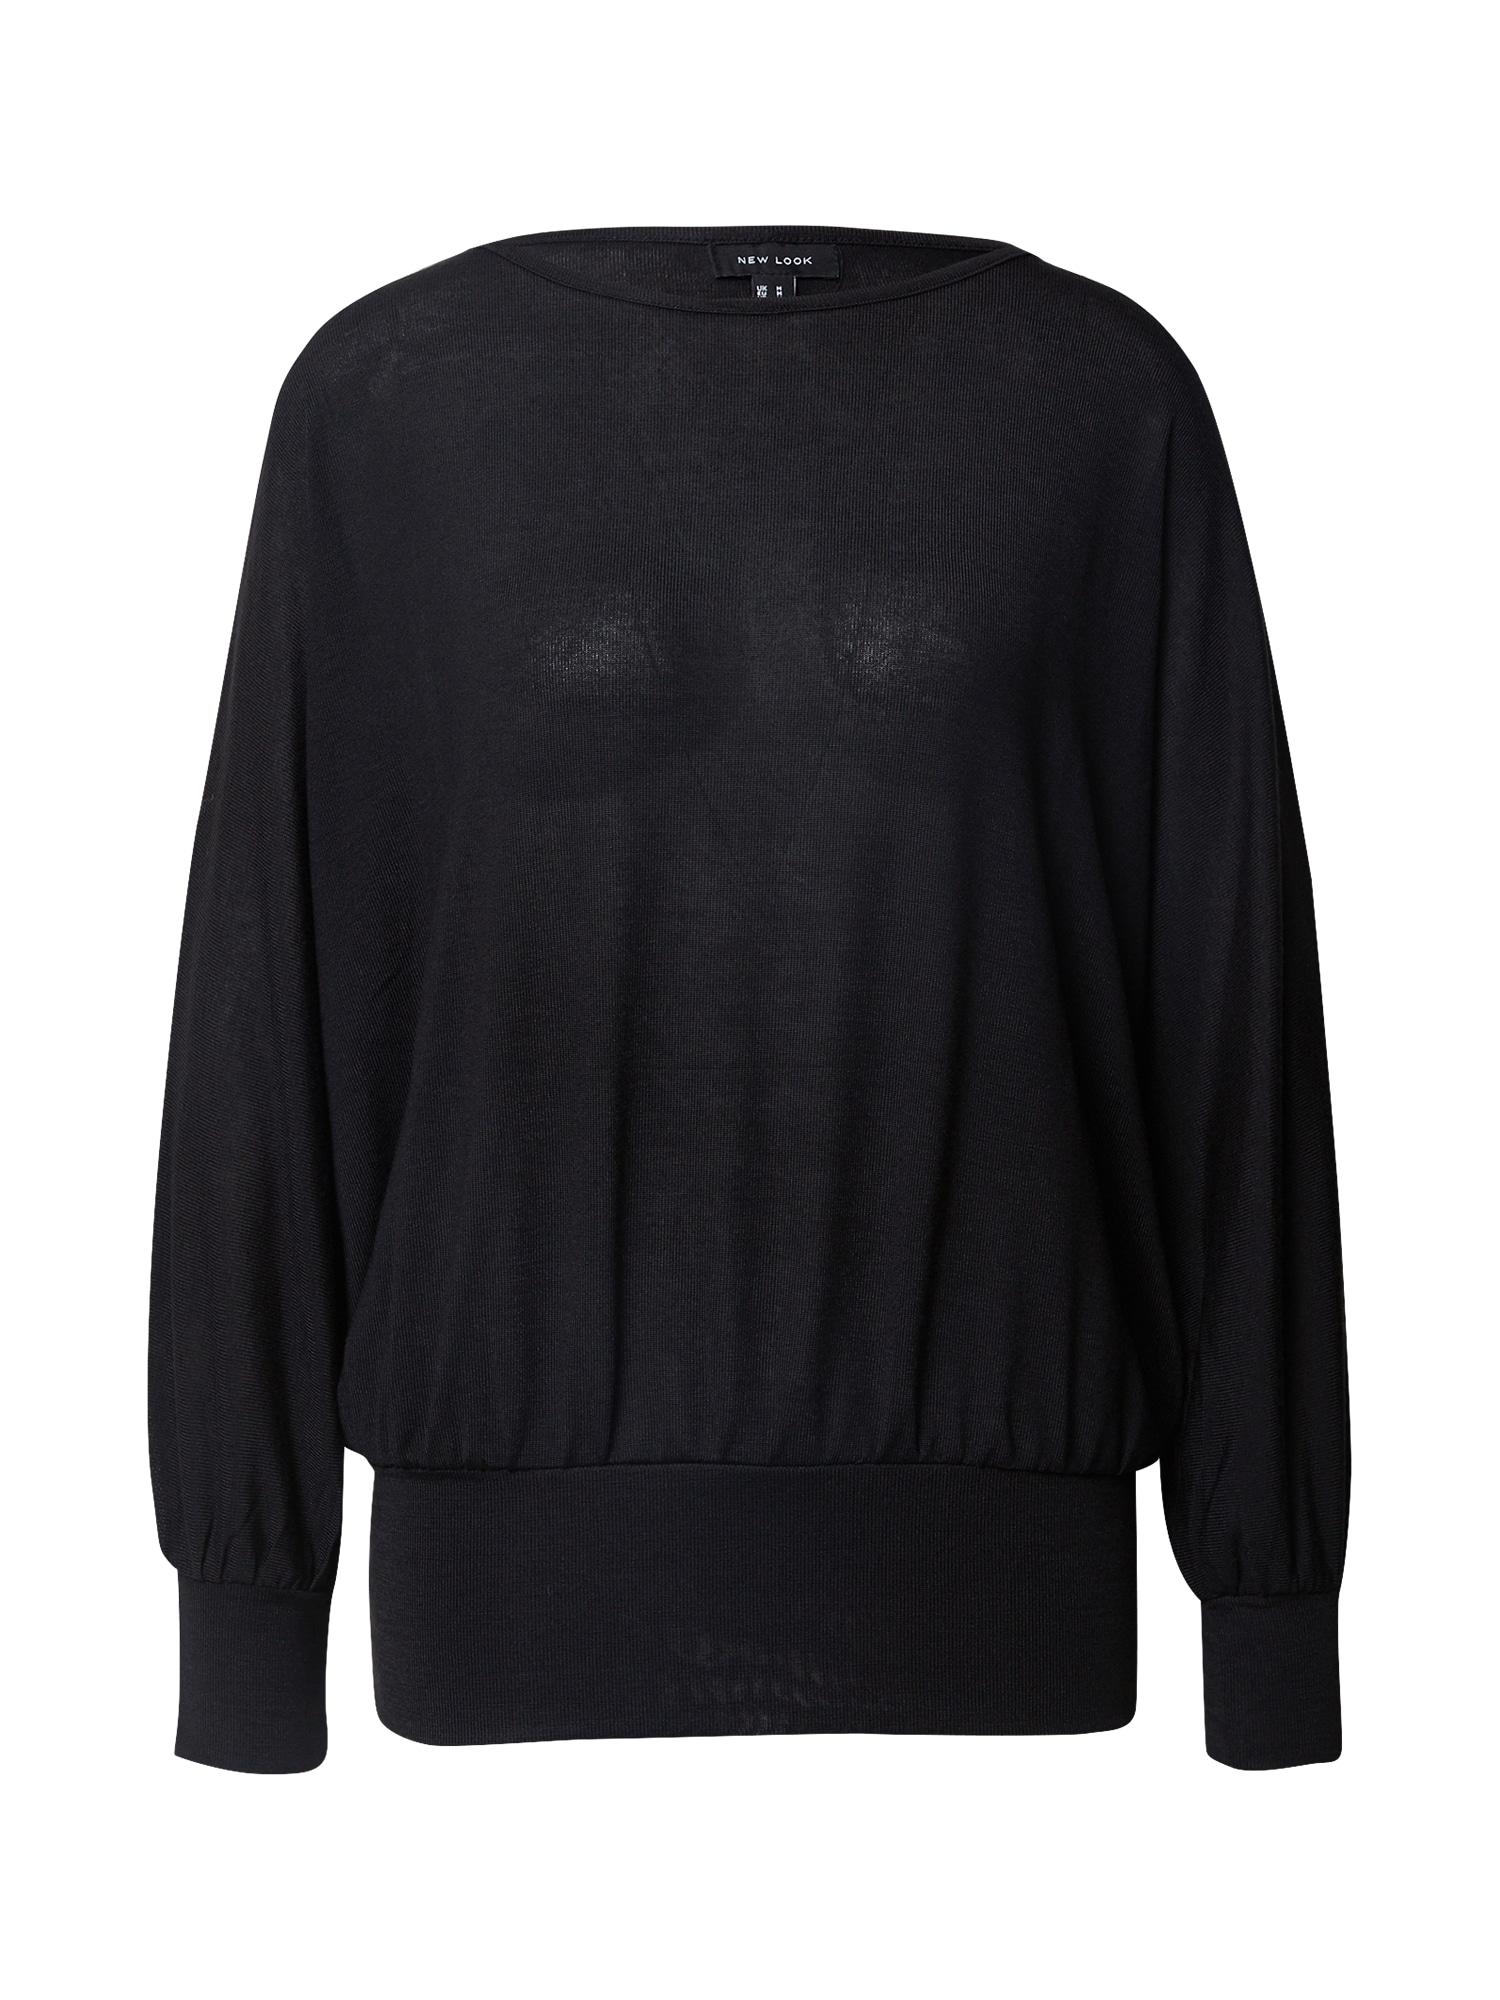 NEW LOOK Megztinis juoda